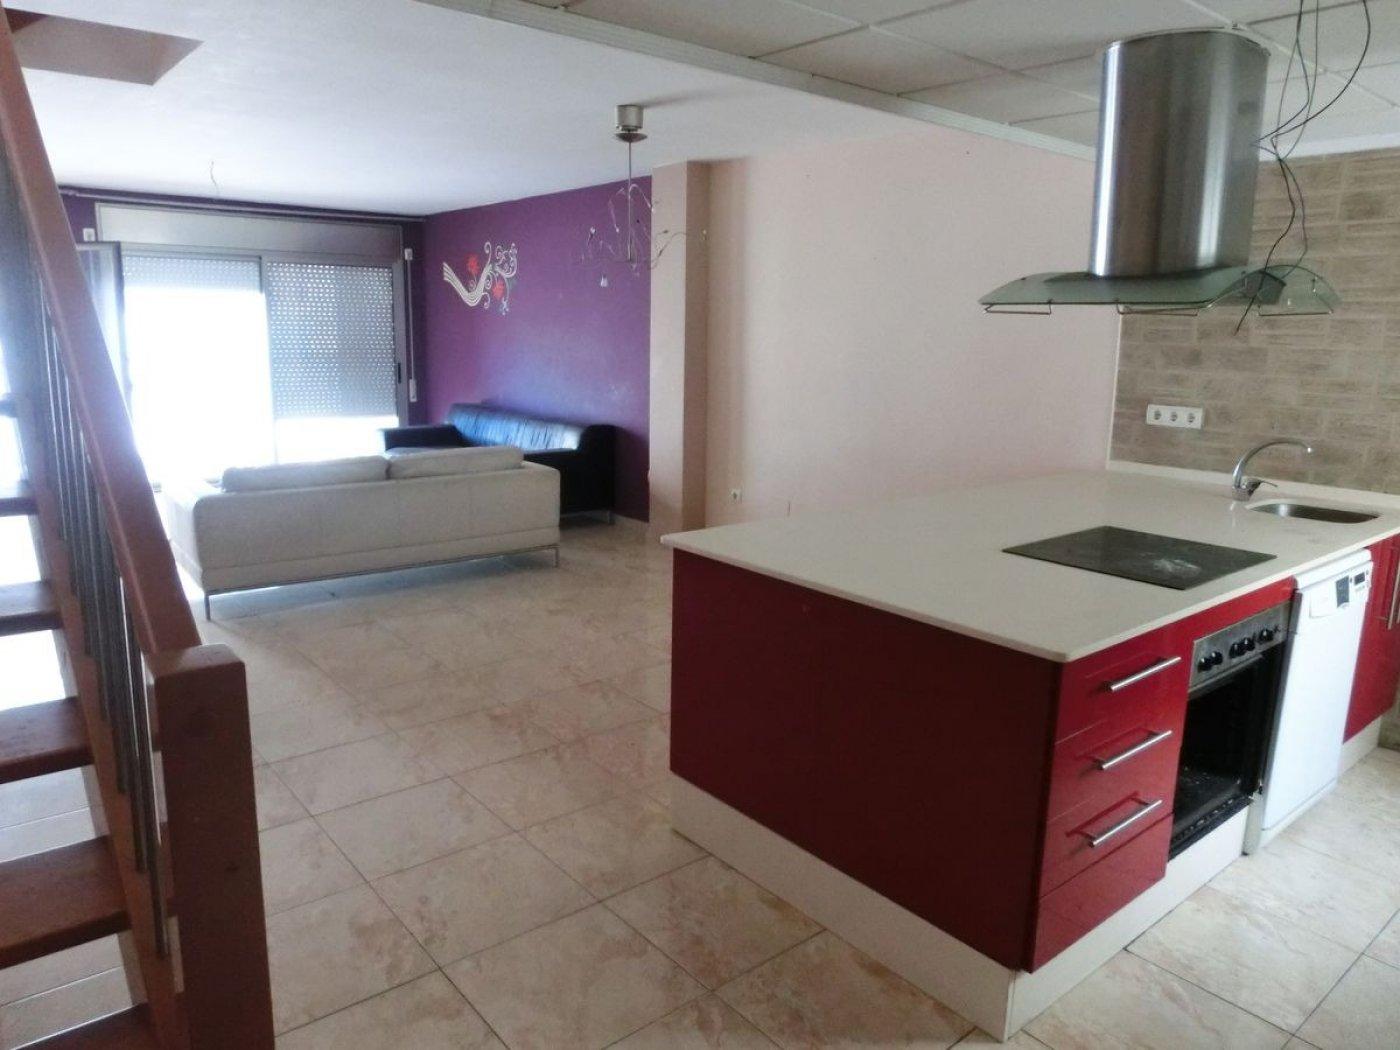 Penthouse for sale in Centro, Sant Carles de la Rapita